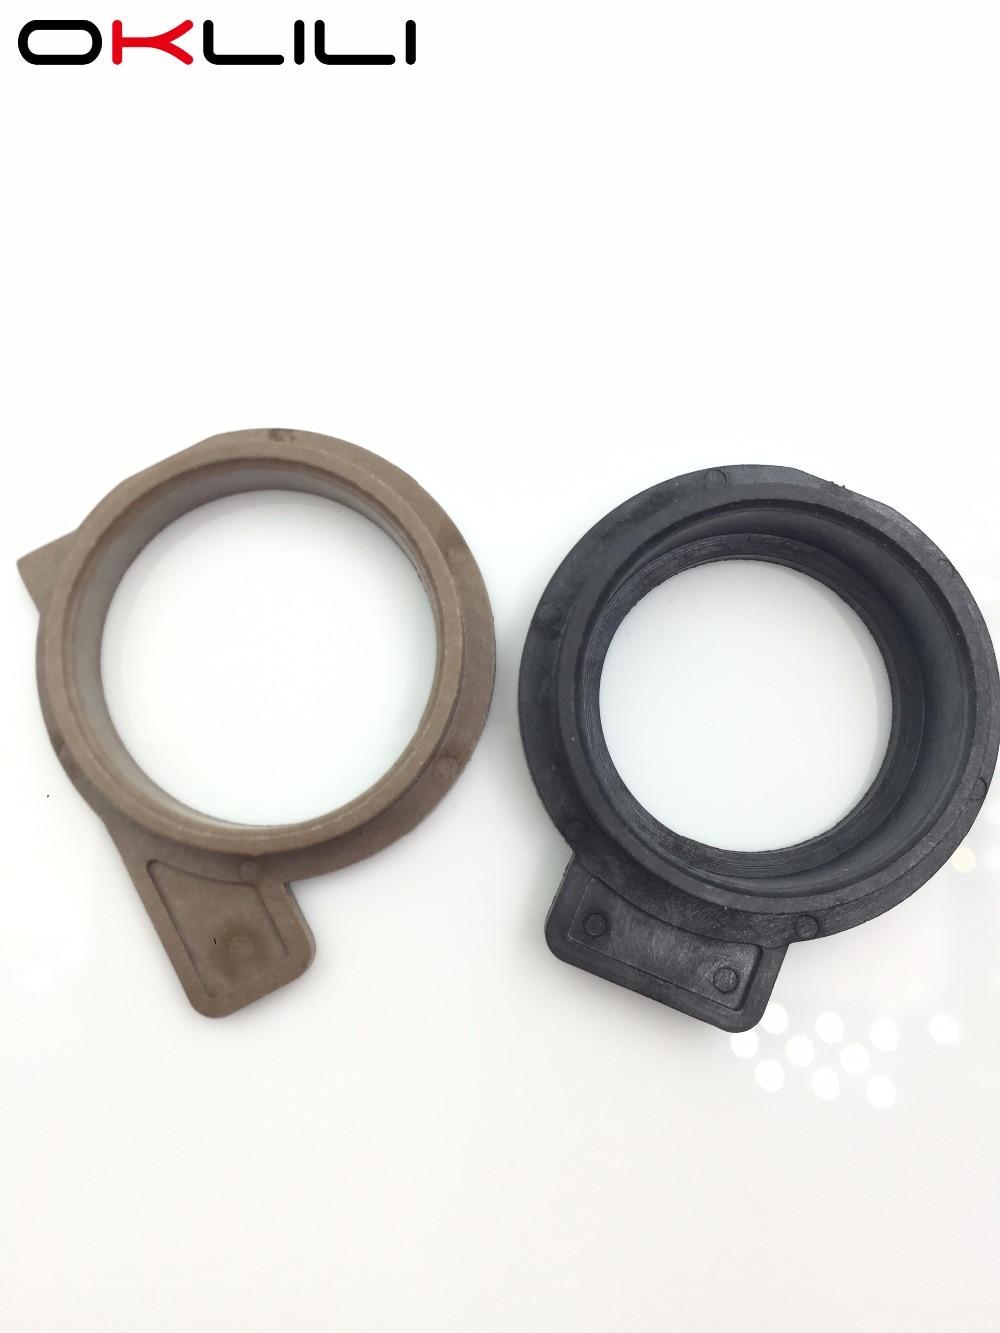 2H425150 2BR20180 upper Roller Bushing for KYOCERA FS1028 FS1128 KM2810 KM2820 FS1300 FS1100 FS2000 FS1030 FS1130 FS1035 FS1135 100x fs1028 pickup roller tire rubber for kyocera fs1300 fs1035 fs1128 fs1135 fs1100 fs1120 fs1124 2br06520 2f906240 2f906230